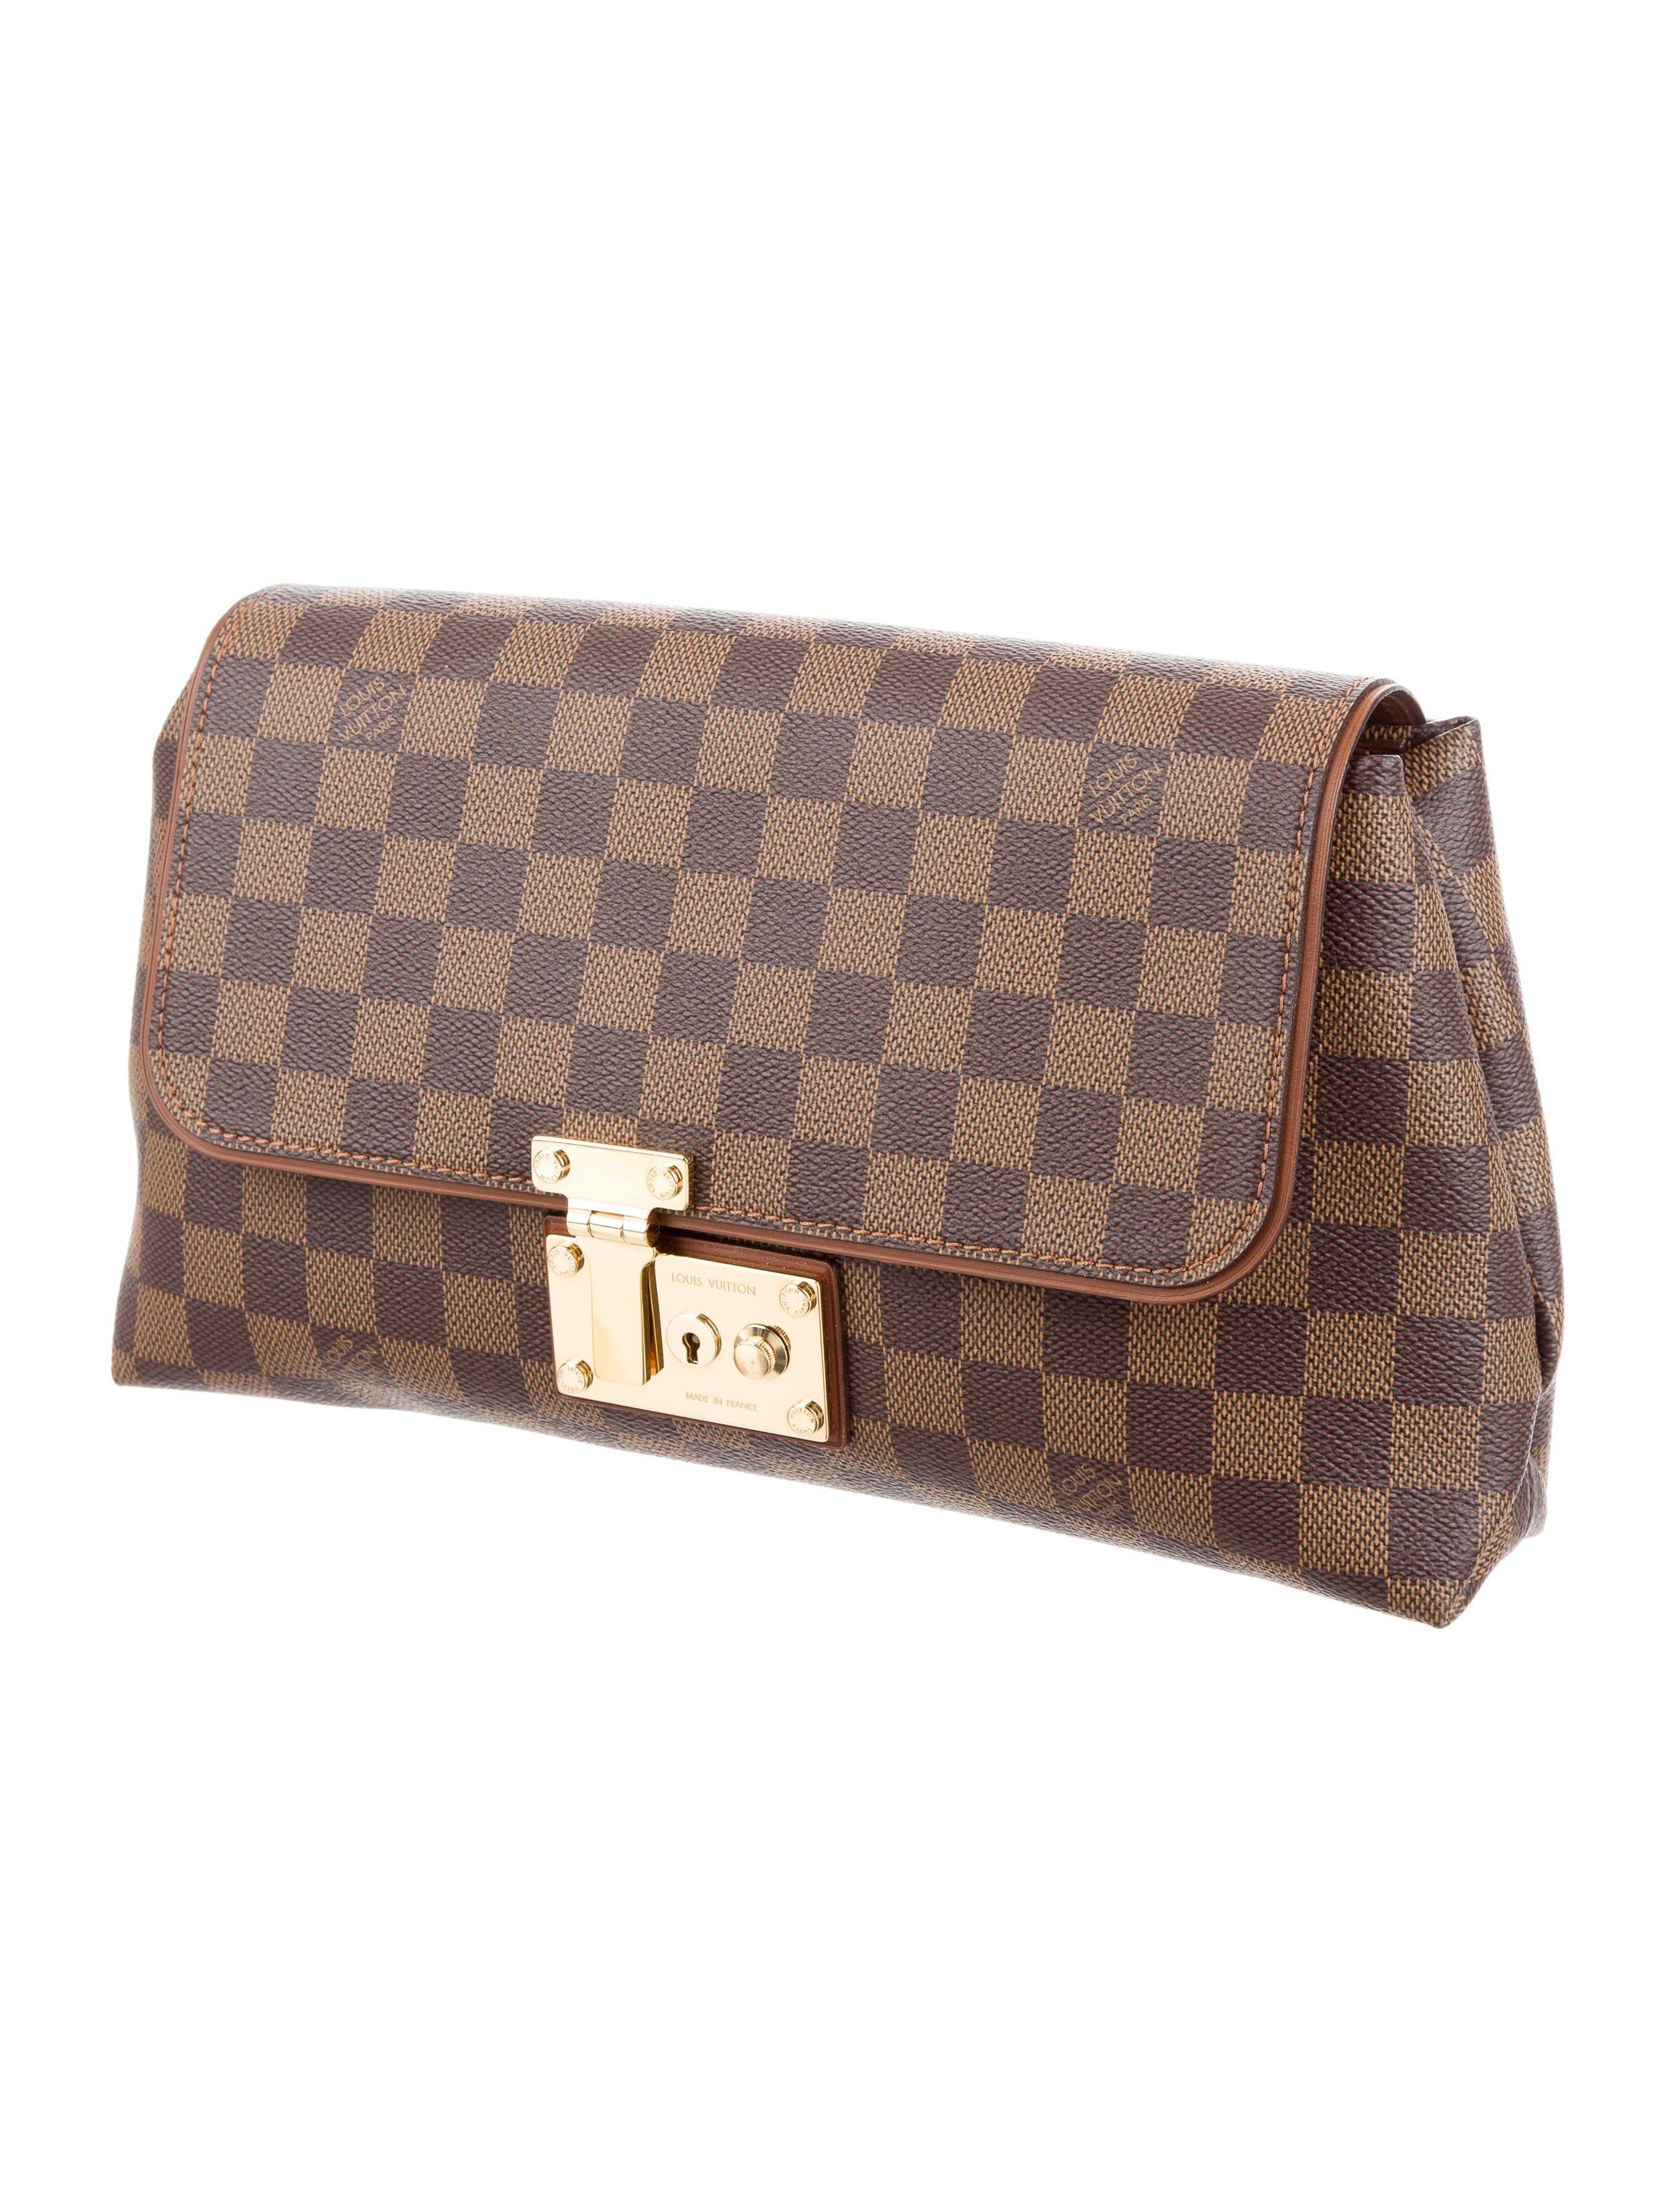 louis vuitton pochette ascot handbags lou114634 the. Black Bedroom Furniture Sets. Home Design Ideas